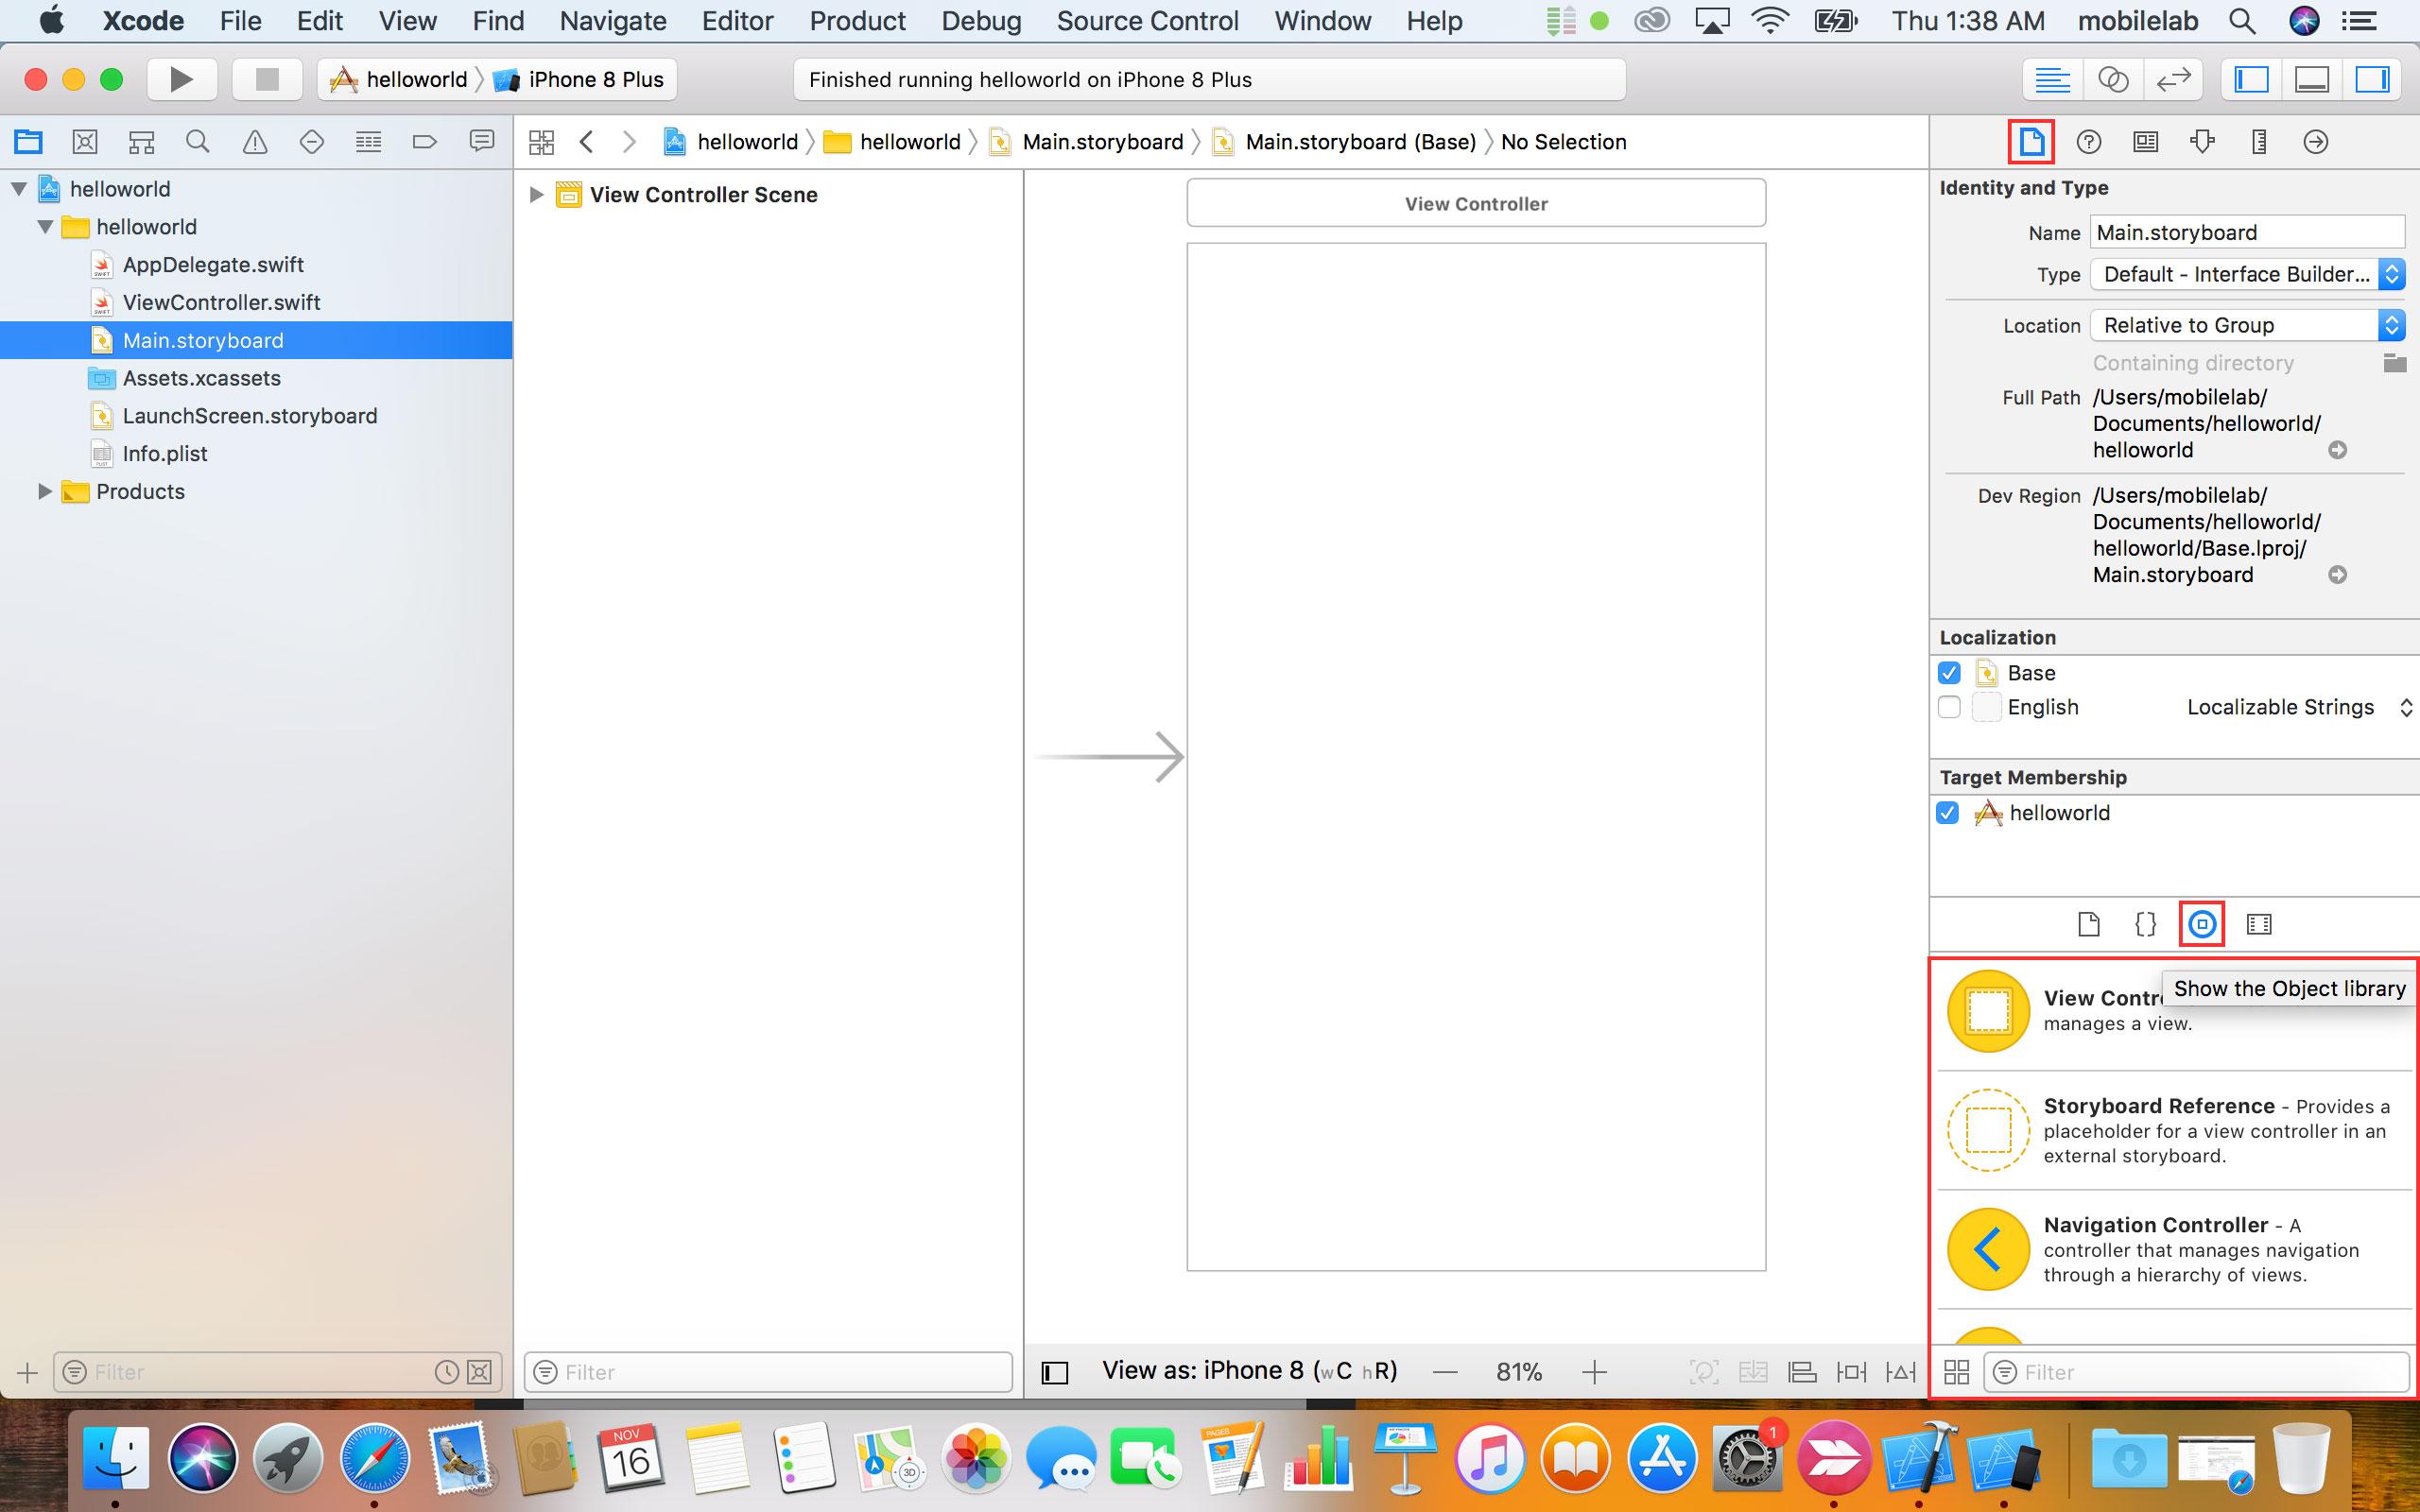 Hello Xcode – Mobile Lab